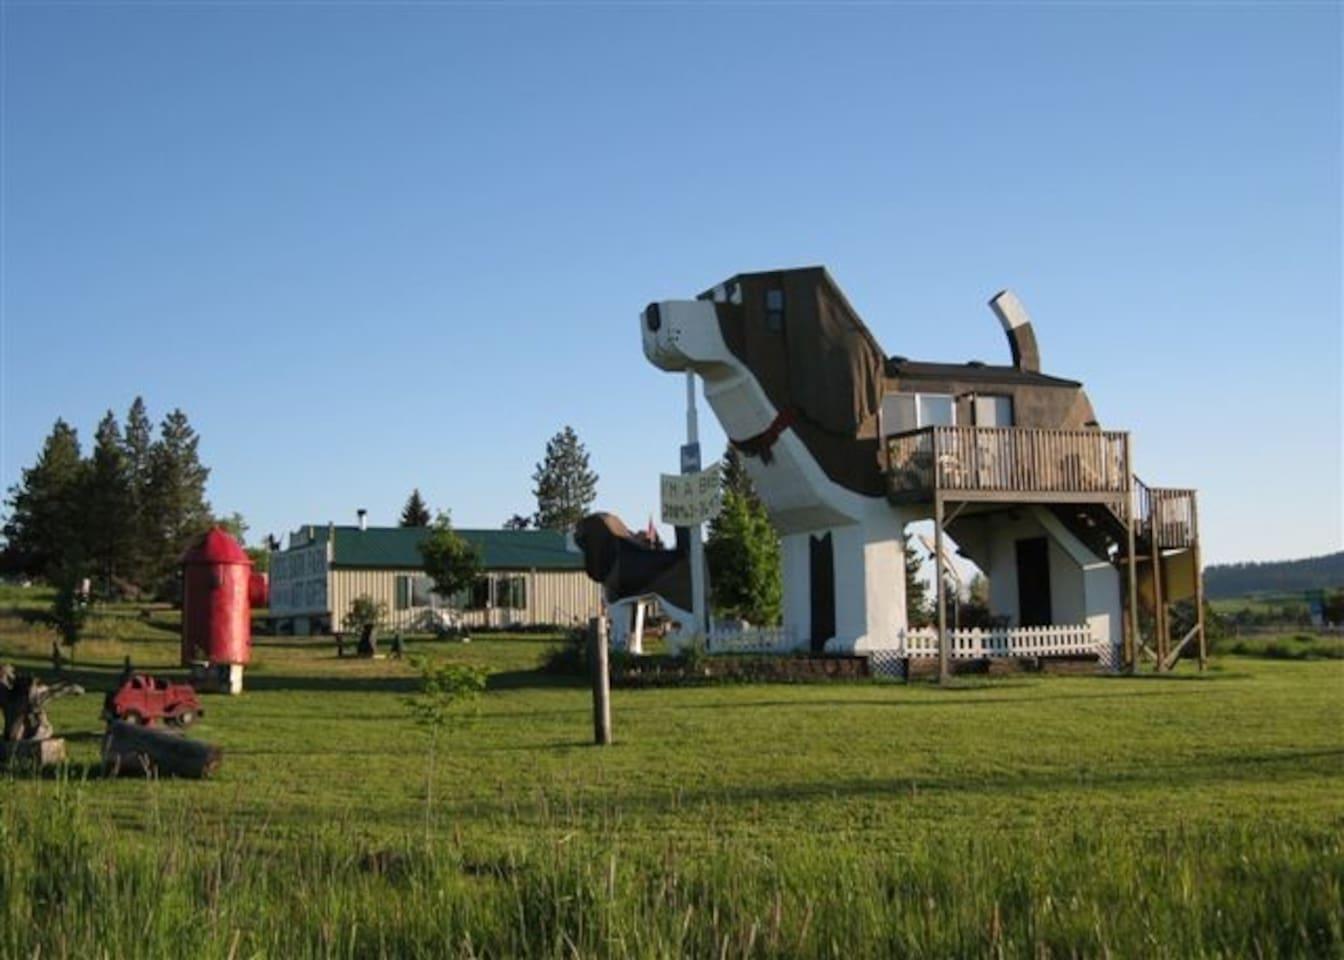 DOG BARK PARK INN, COTTONWOOD (ZDA)